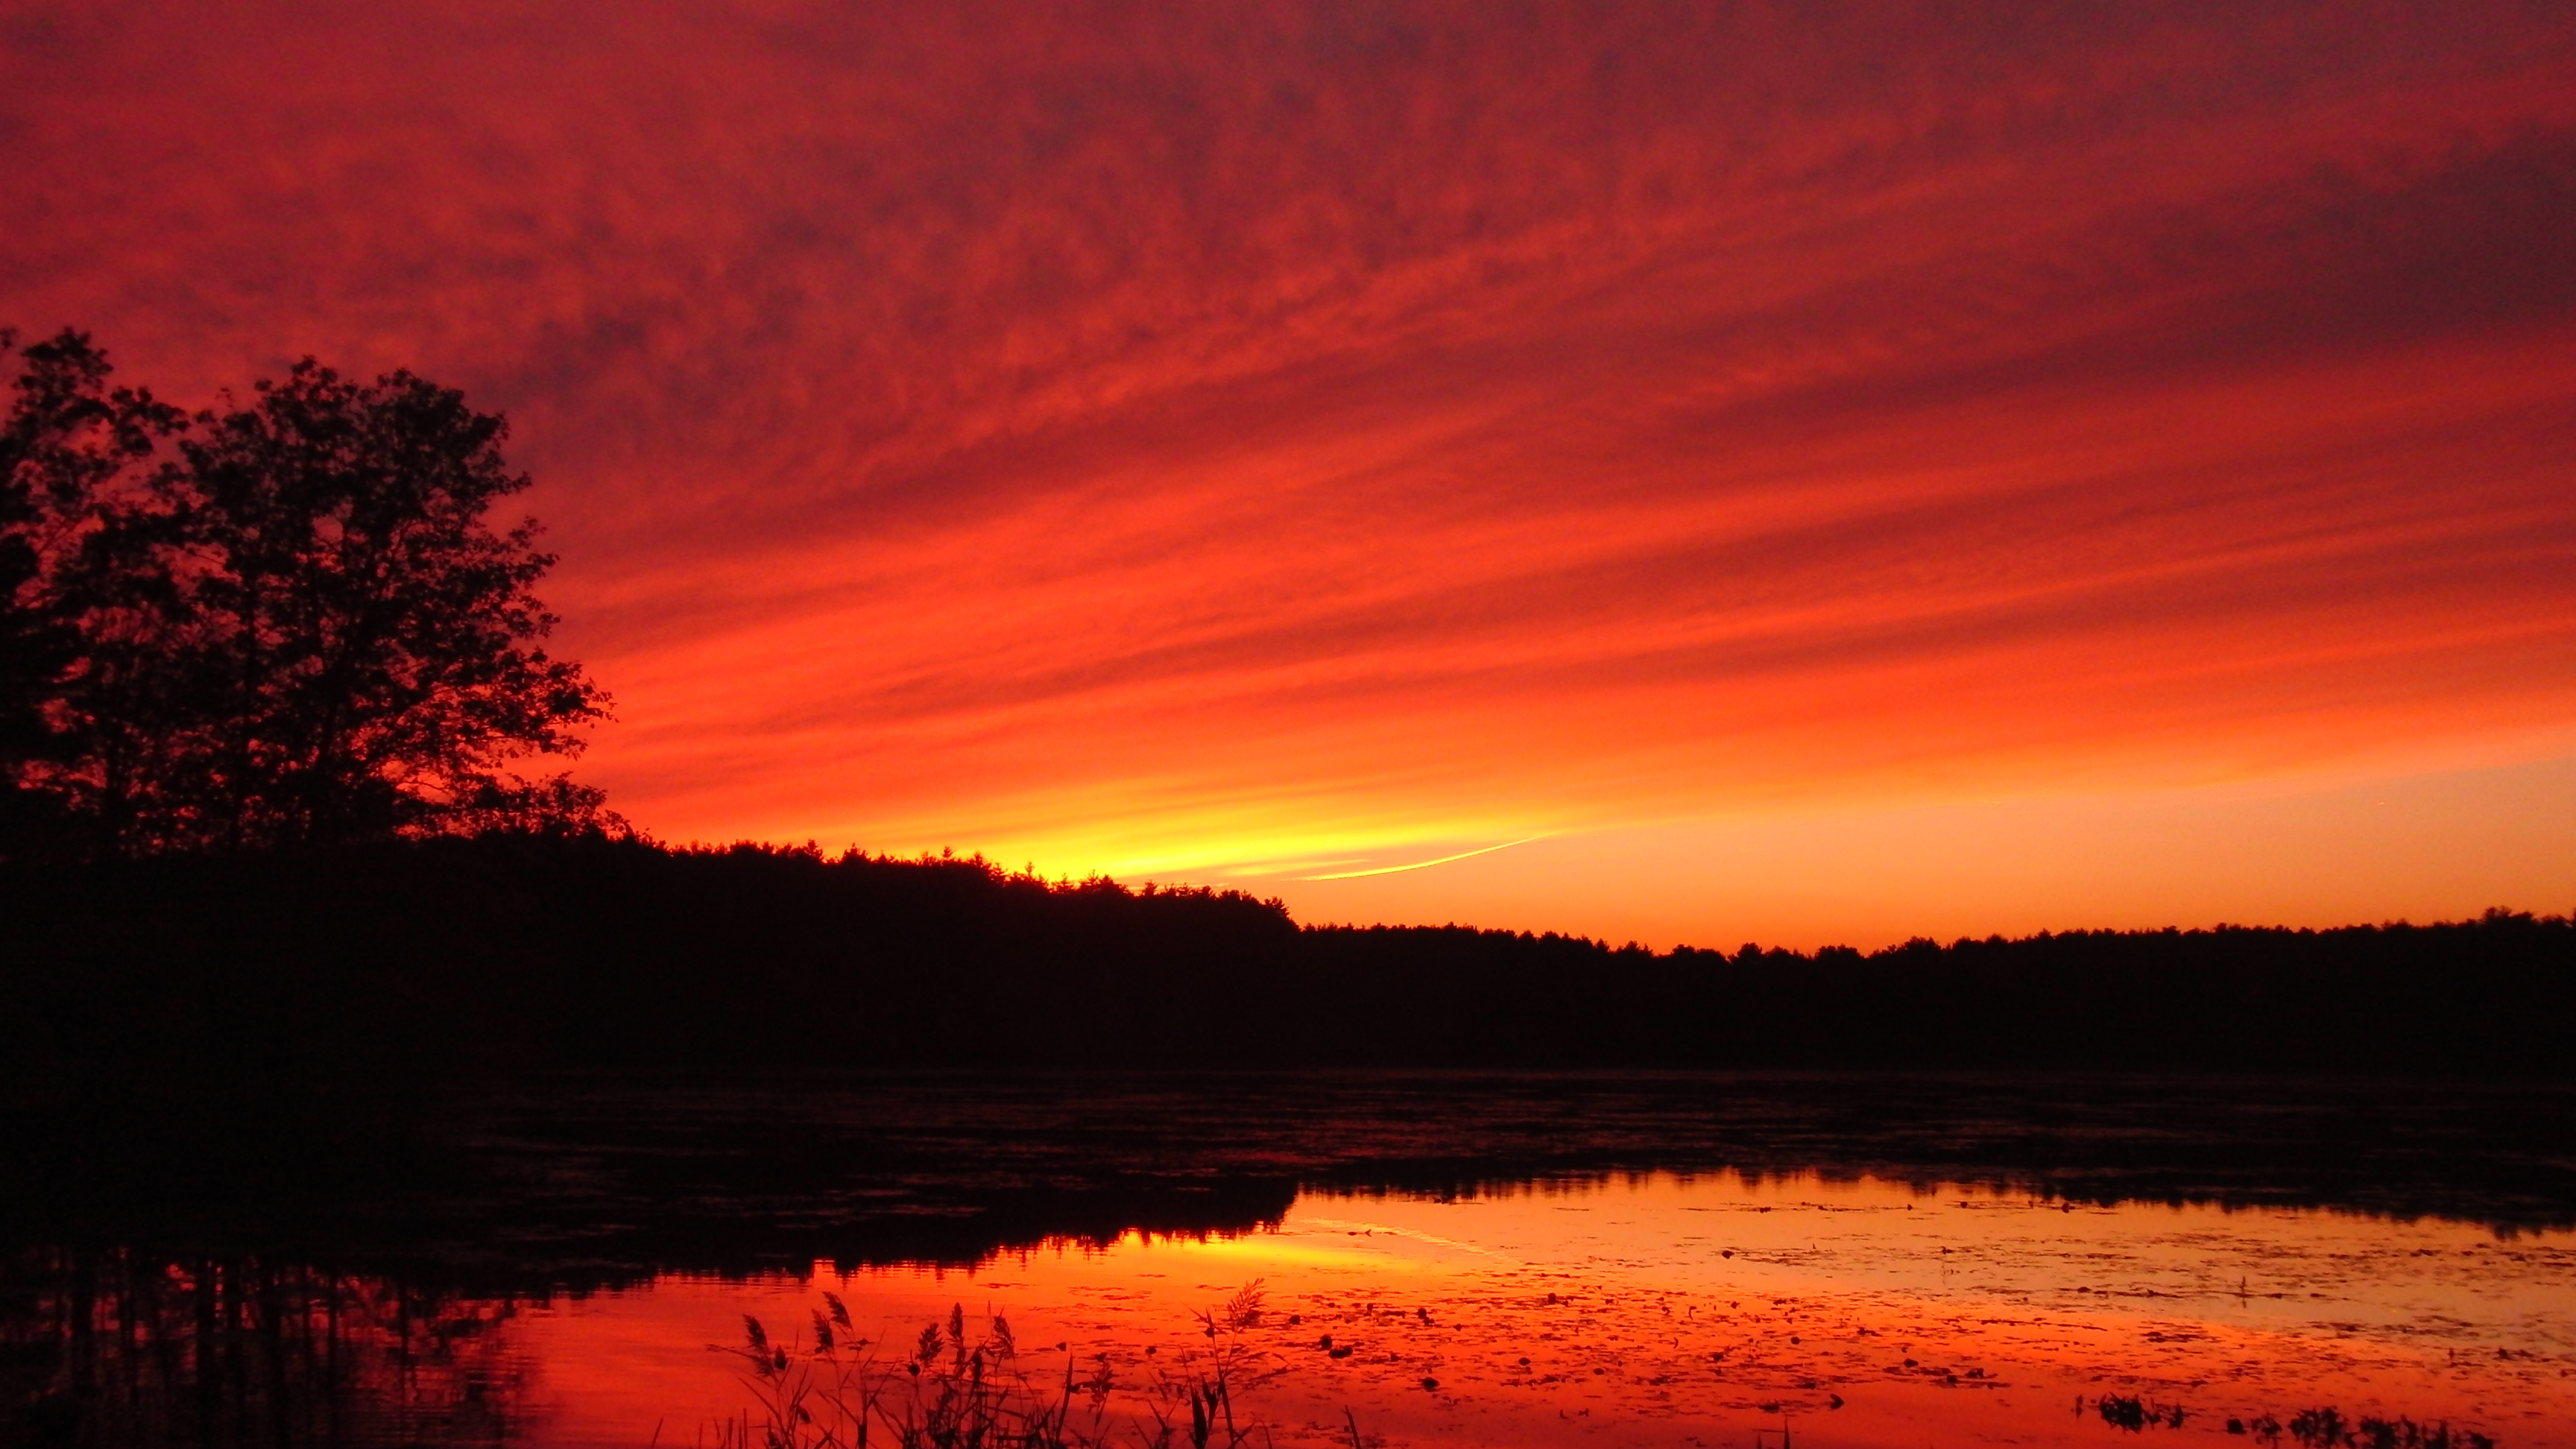 4k Fall Michigan Wallpaper Sunset Wildlife Photos Delaney Wma